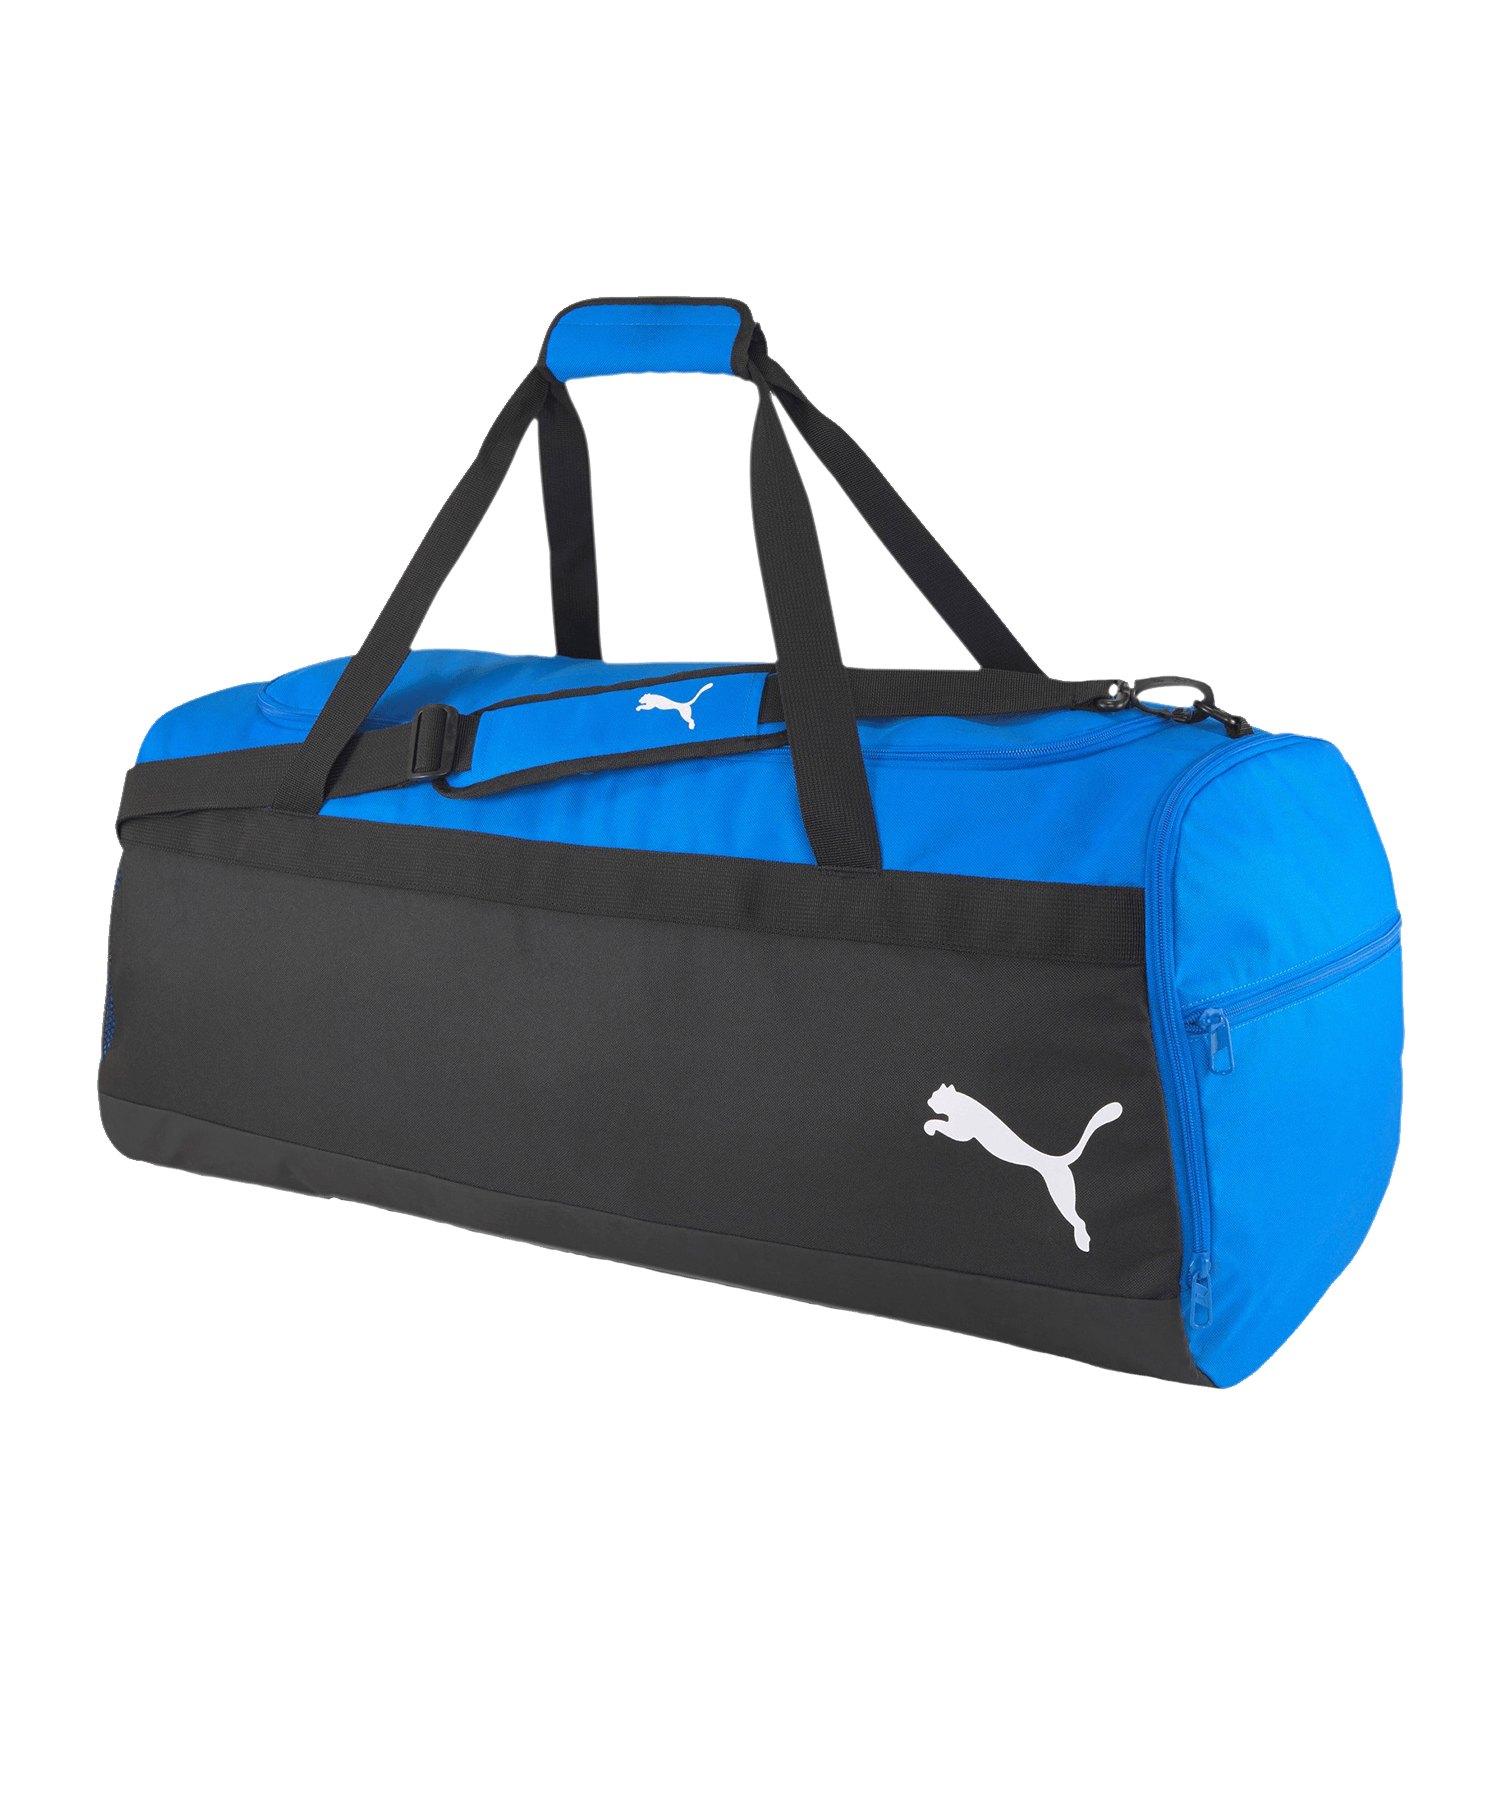 PUMA teamGOAL 23 Teambag Sporttasche GR. L F02 - blau